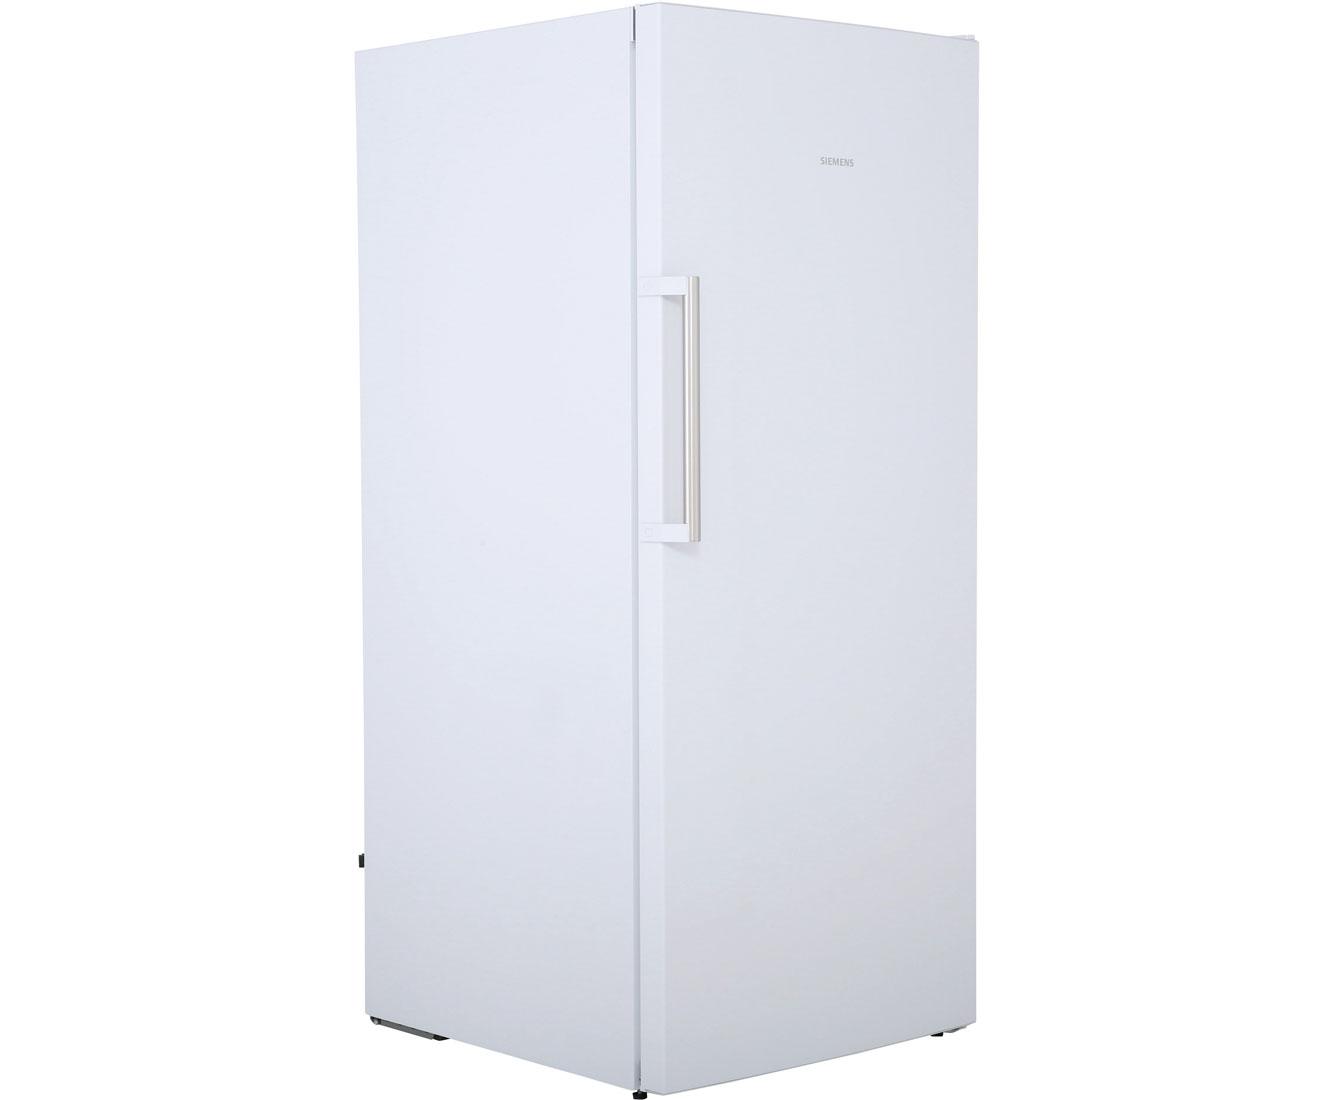 Siemens Kühlschrank Hotline : Siemens kühlschrank service hotline siemens studioline sn d pe